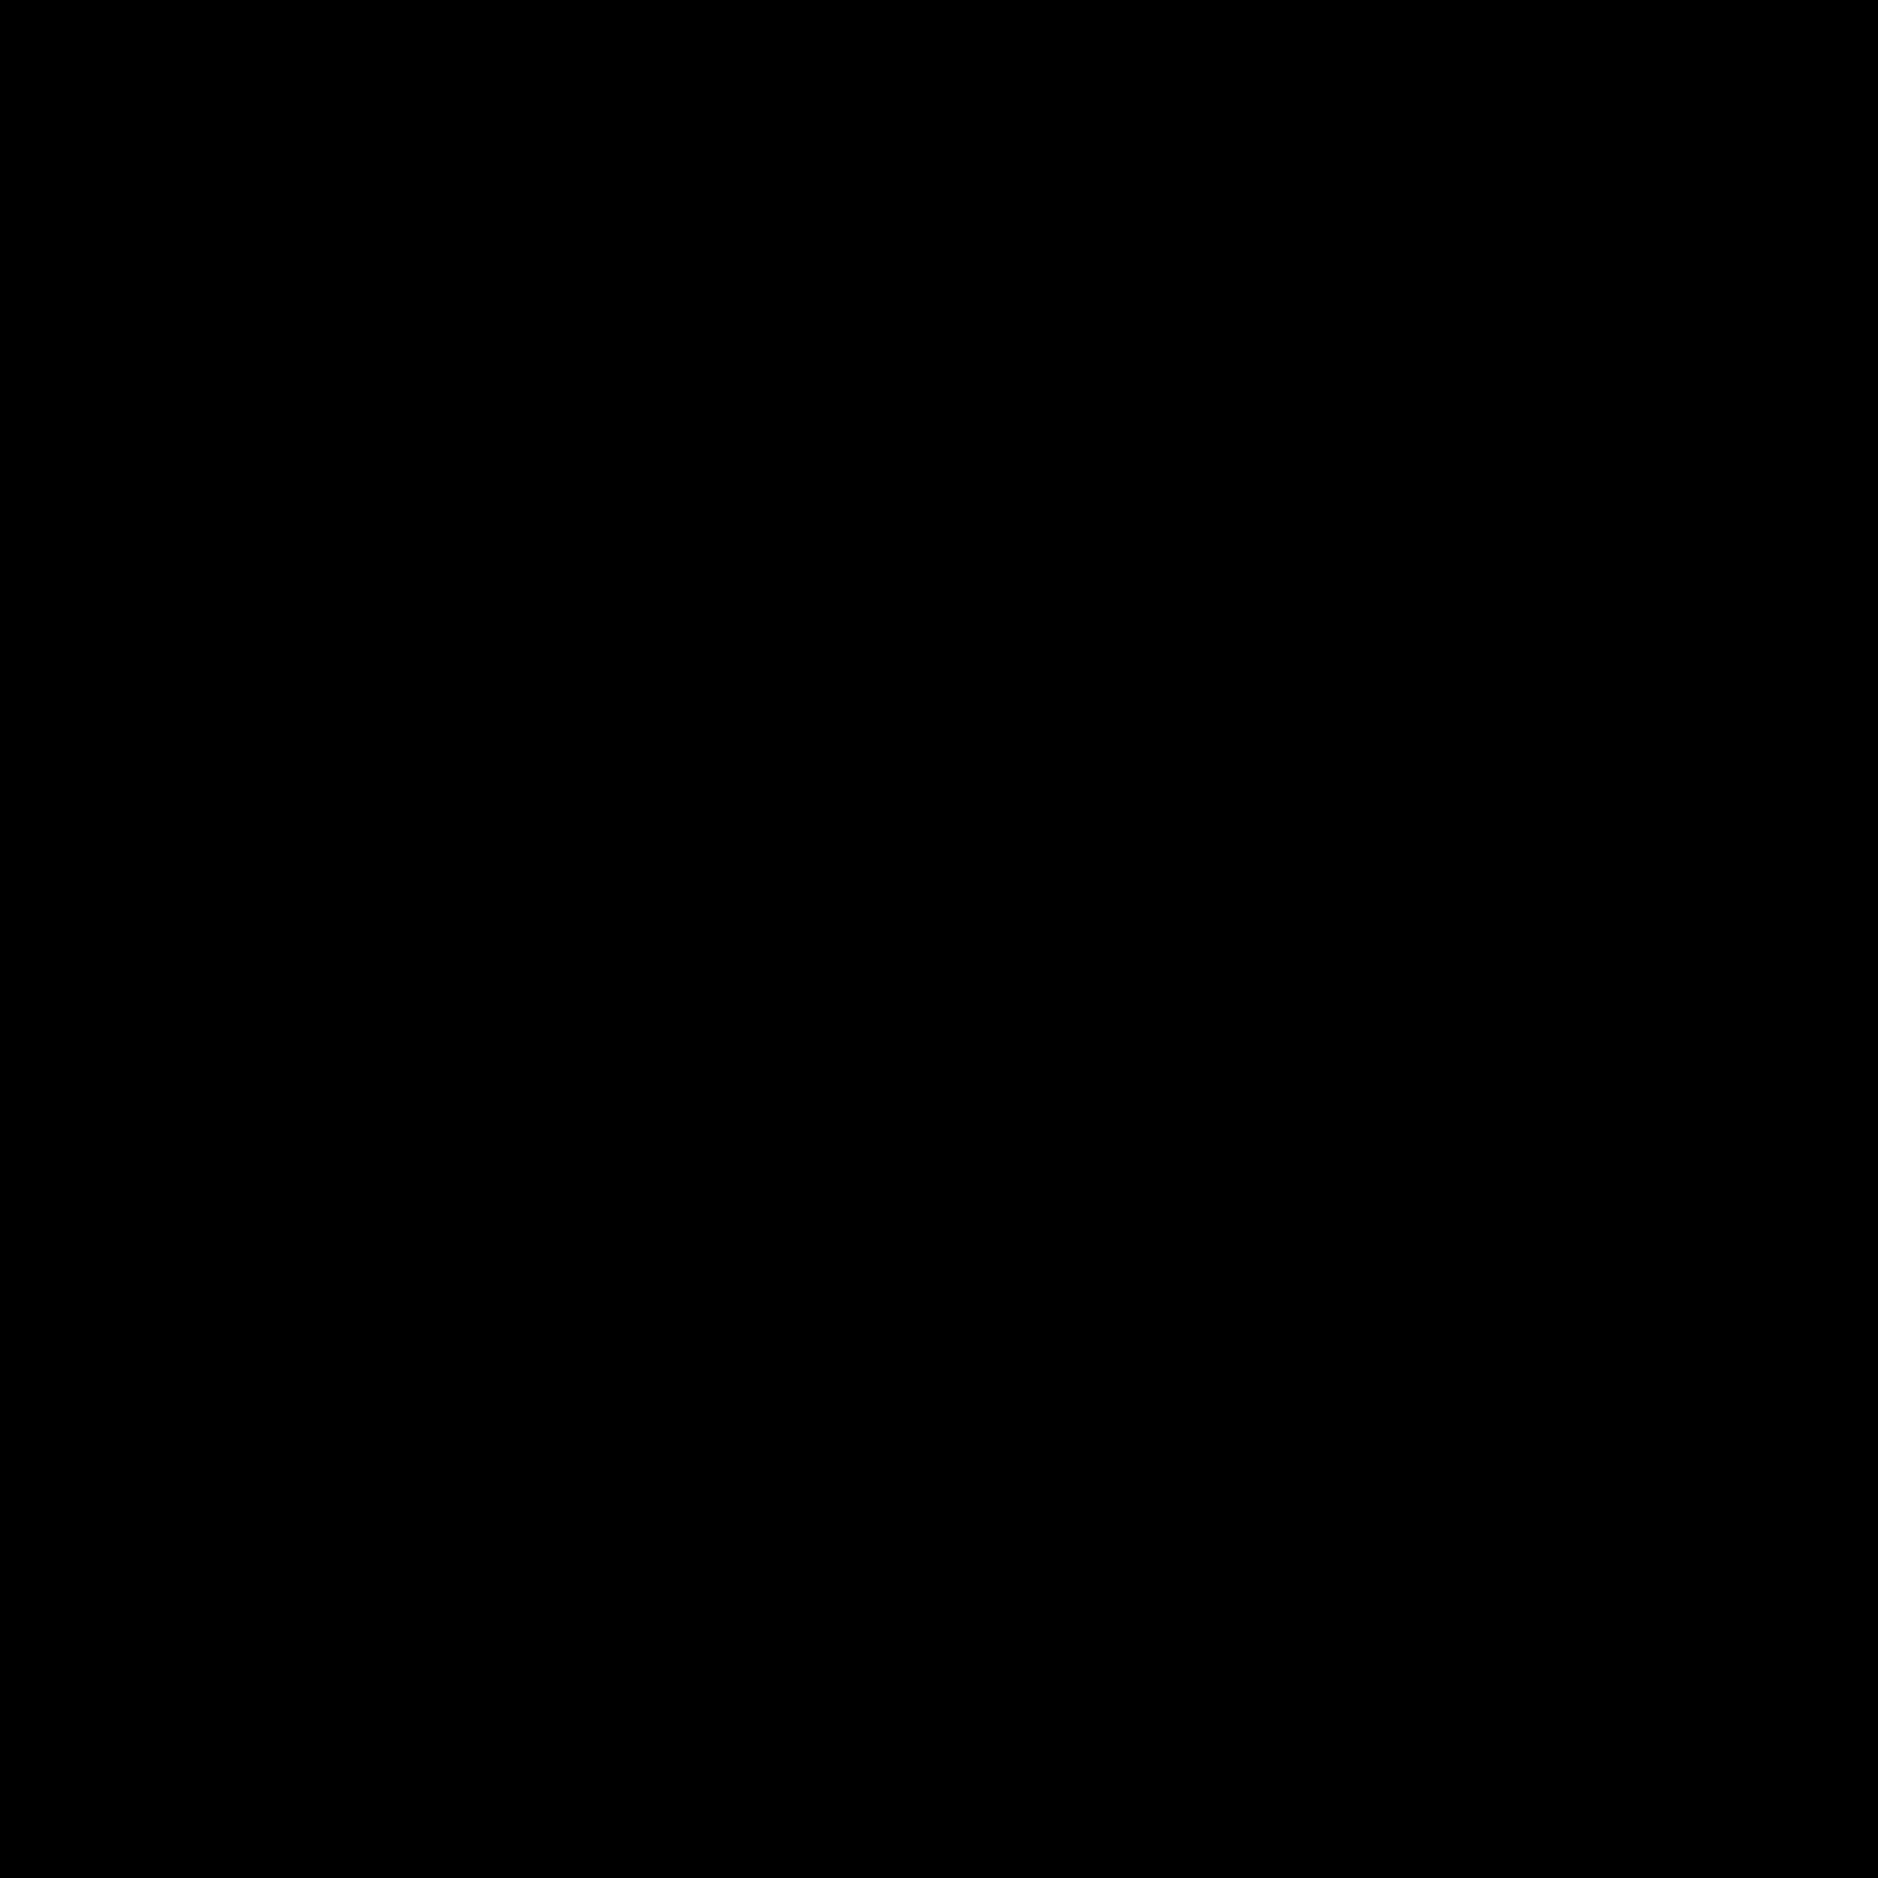 Charchli-Tee